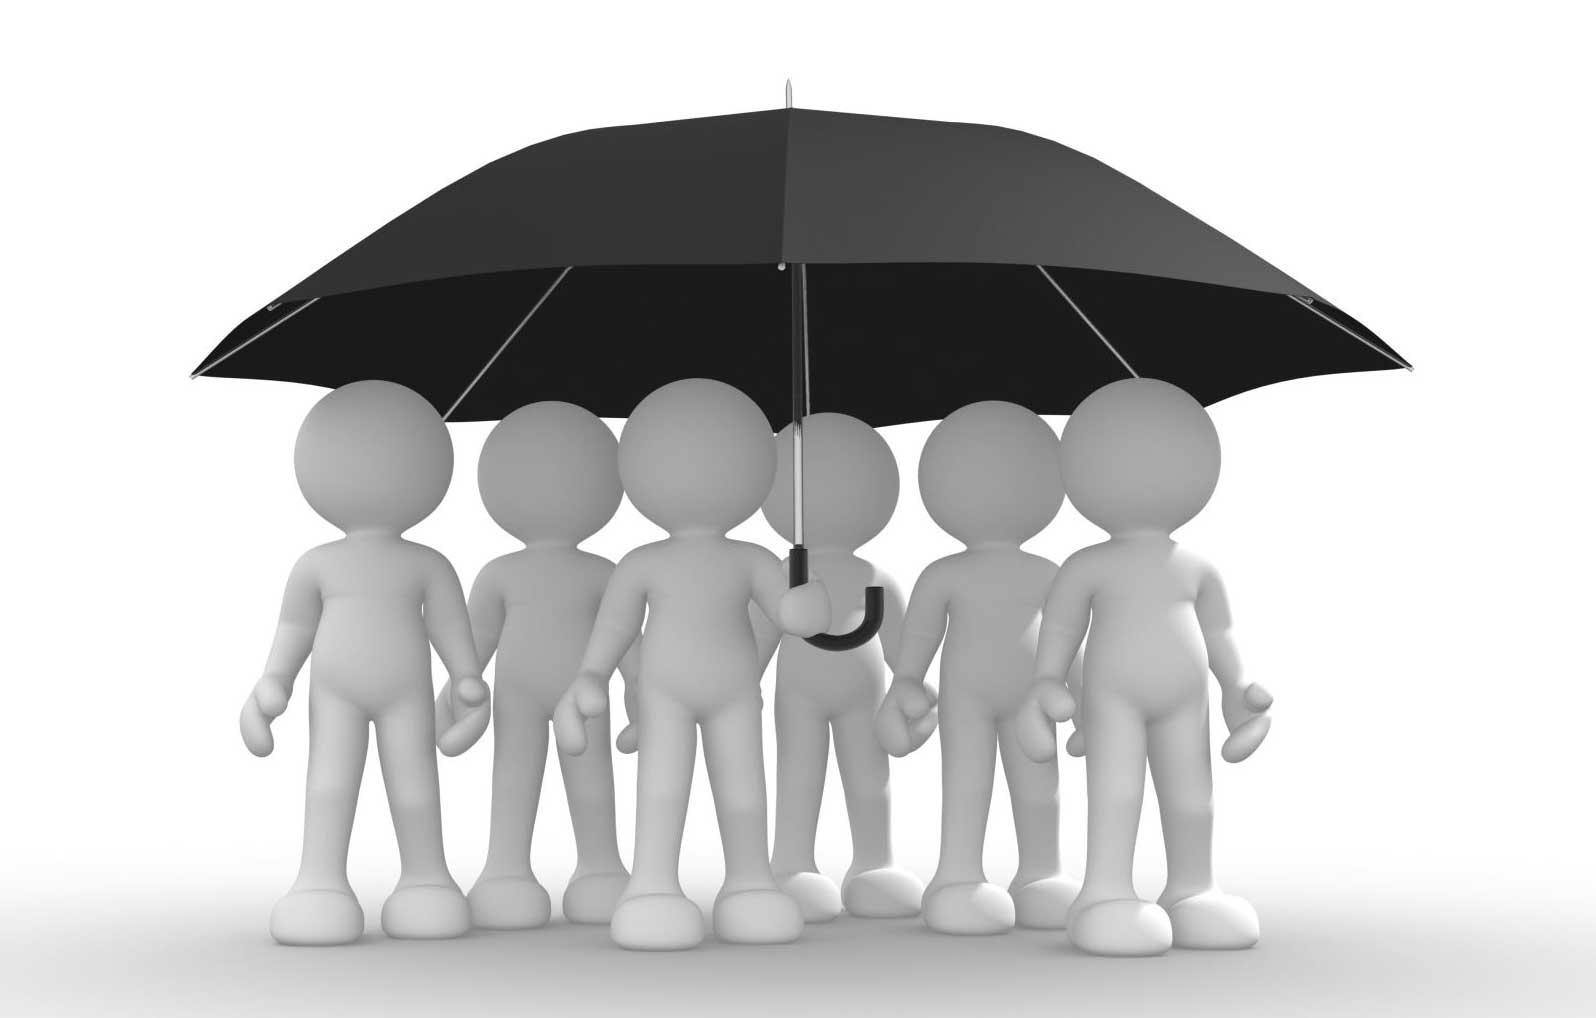 umbrella employee group insurance